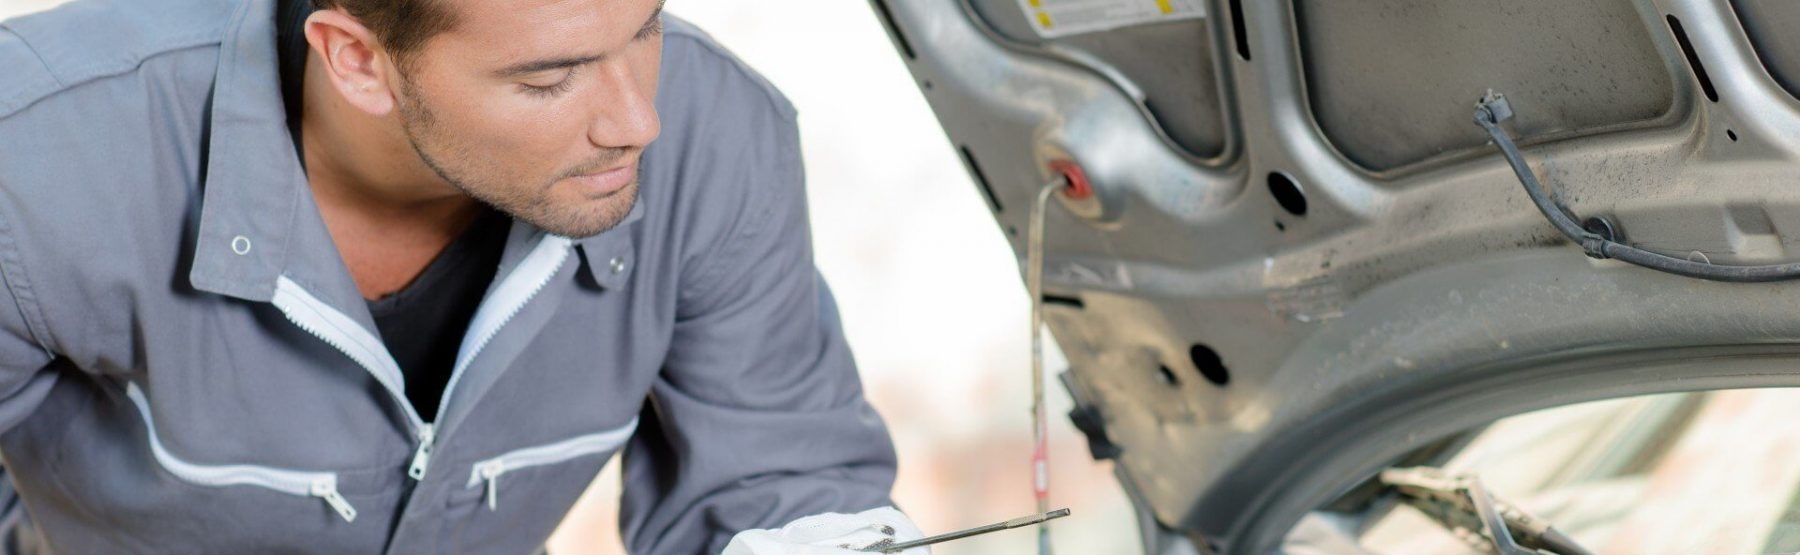 Car Mechanic (@mechanicdublin) Cover Image